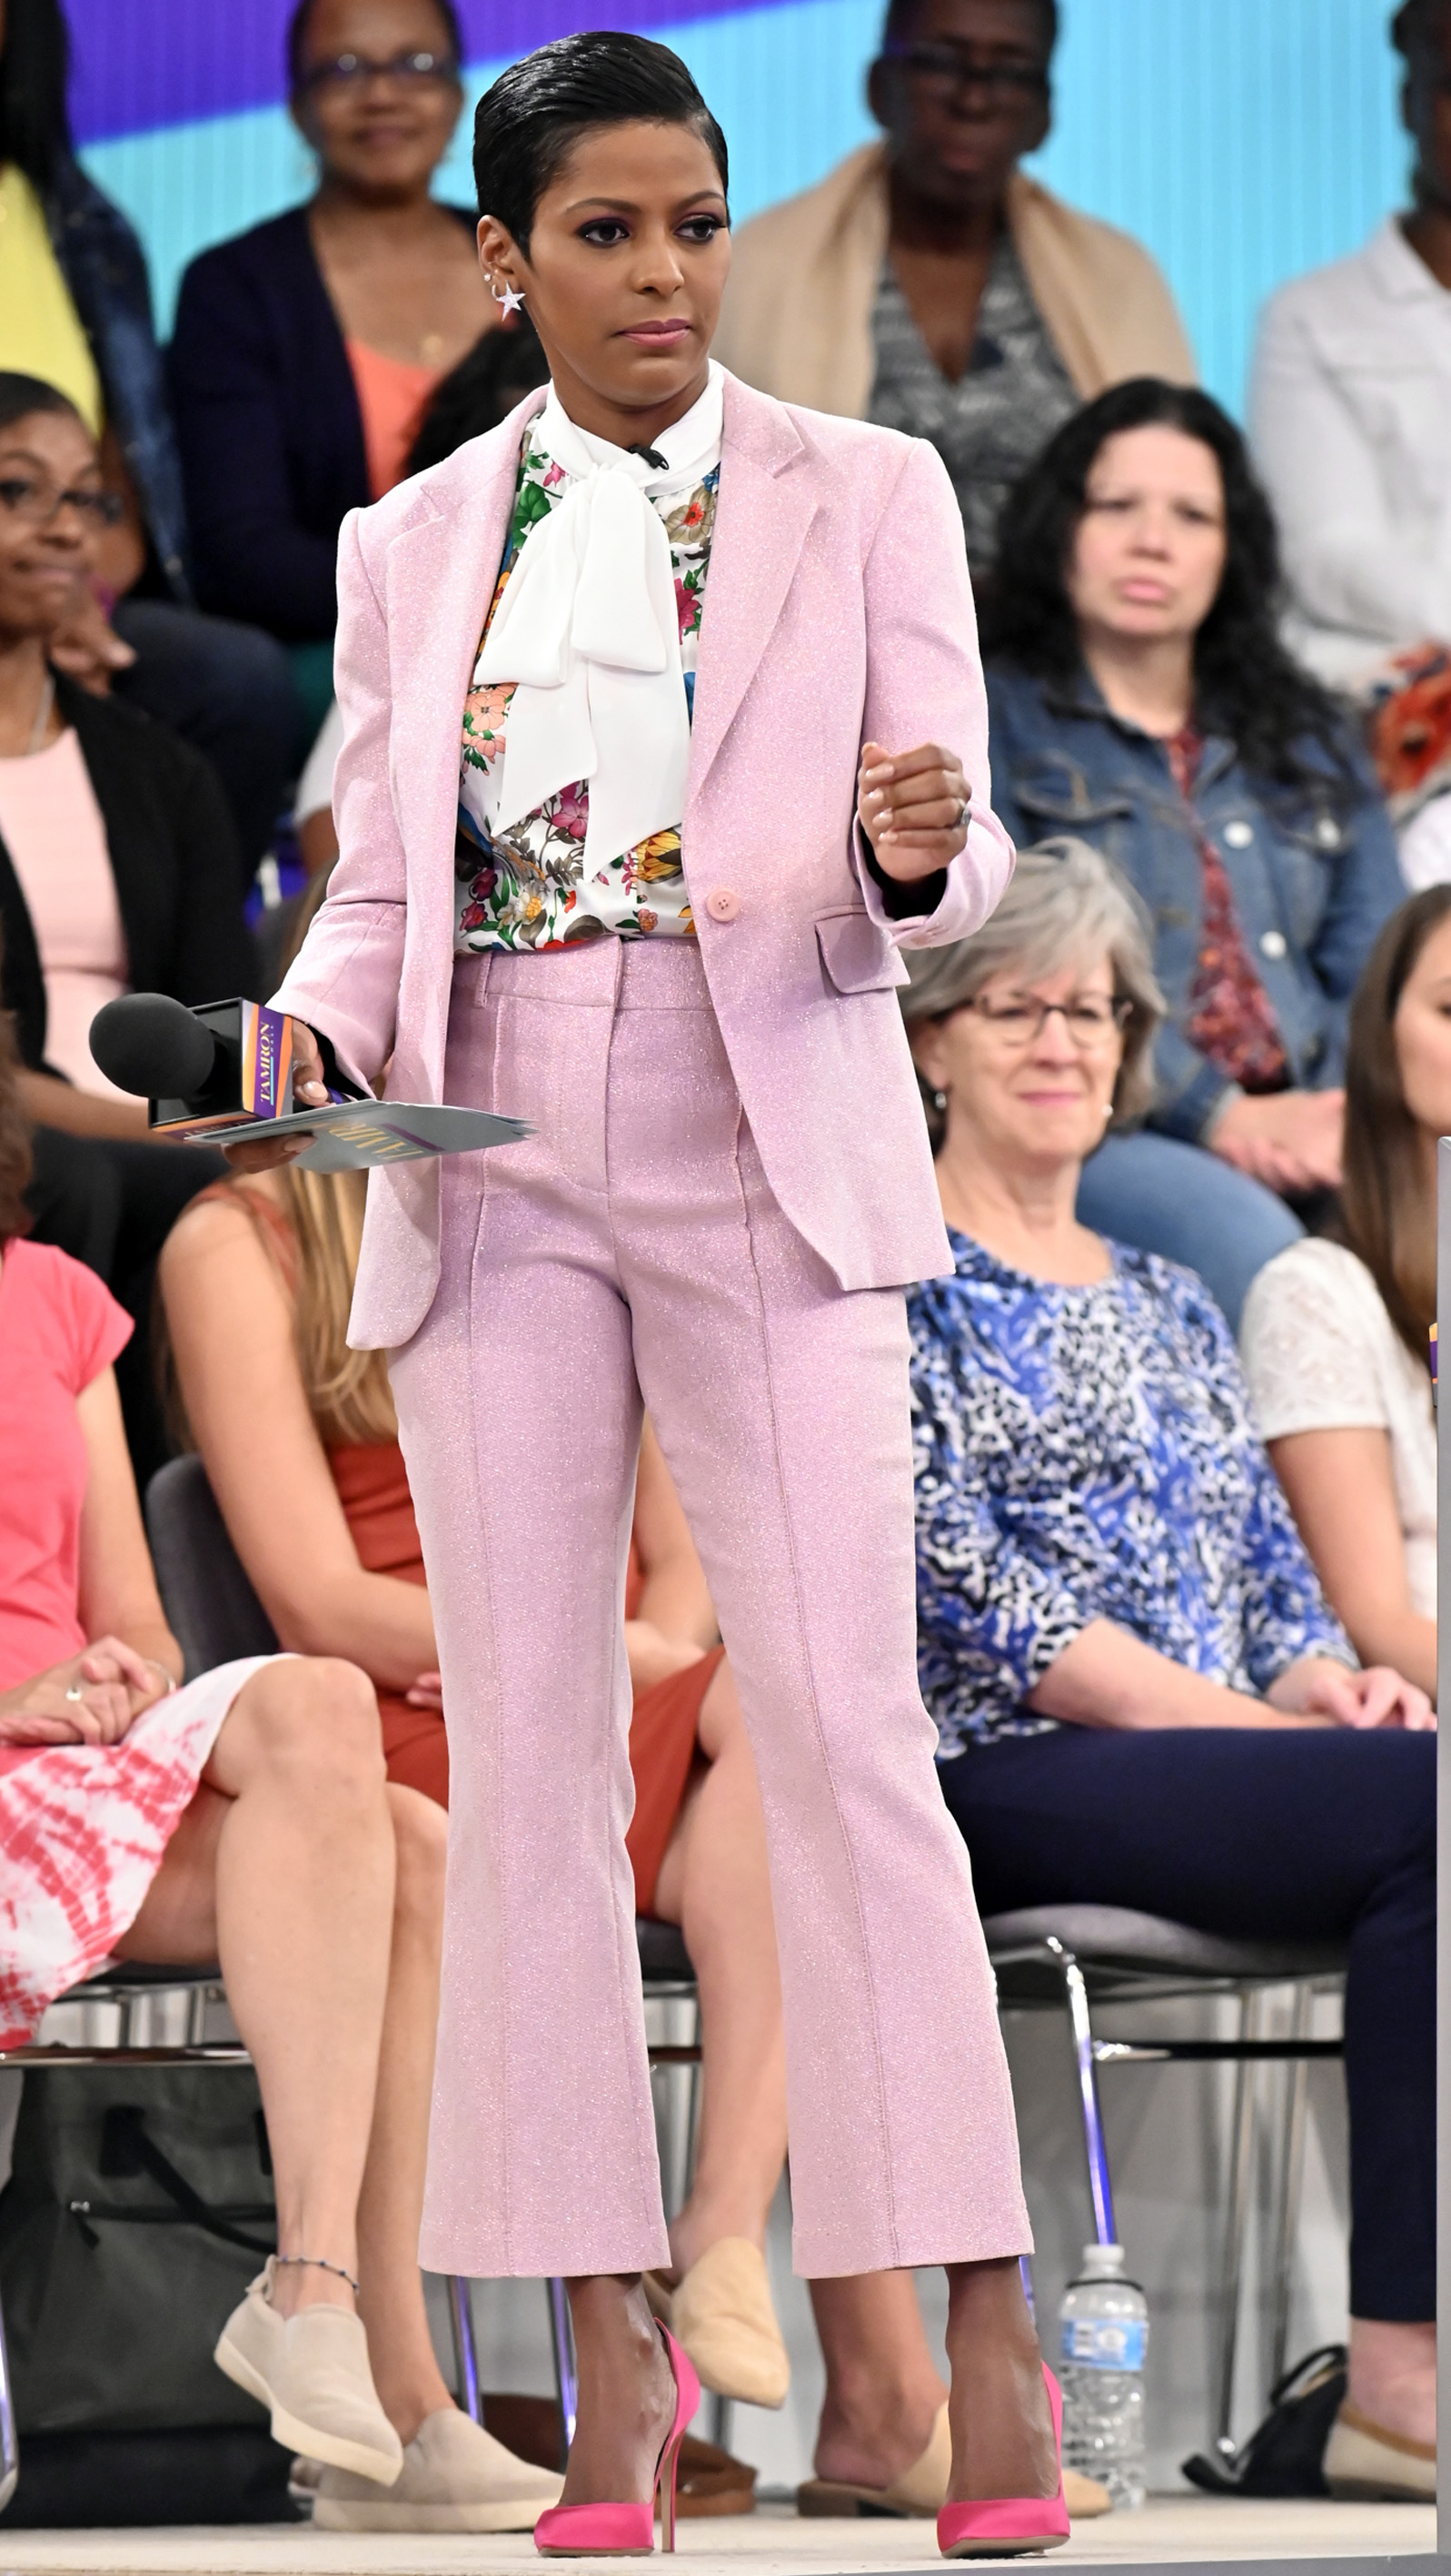 Pink Suit by Sies MarjanFloral Silk Blouse by Edeltrud HofmannHot Pink Silk Pump by Gianvito RossiStar Earrings by Jennifer Miller